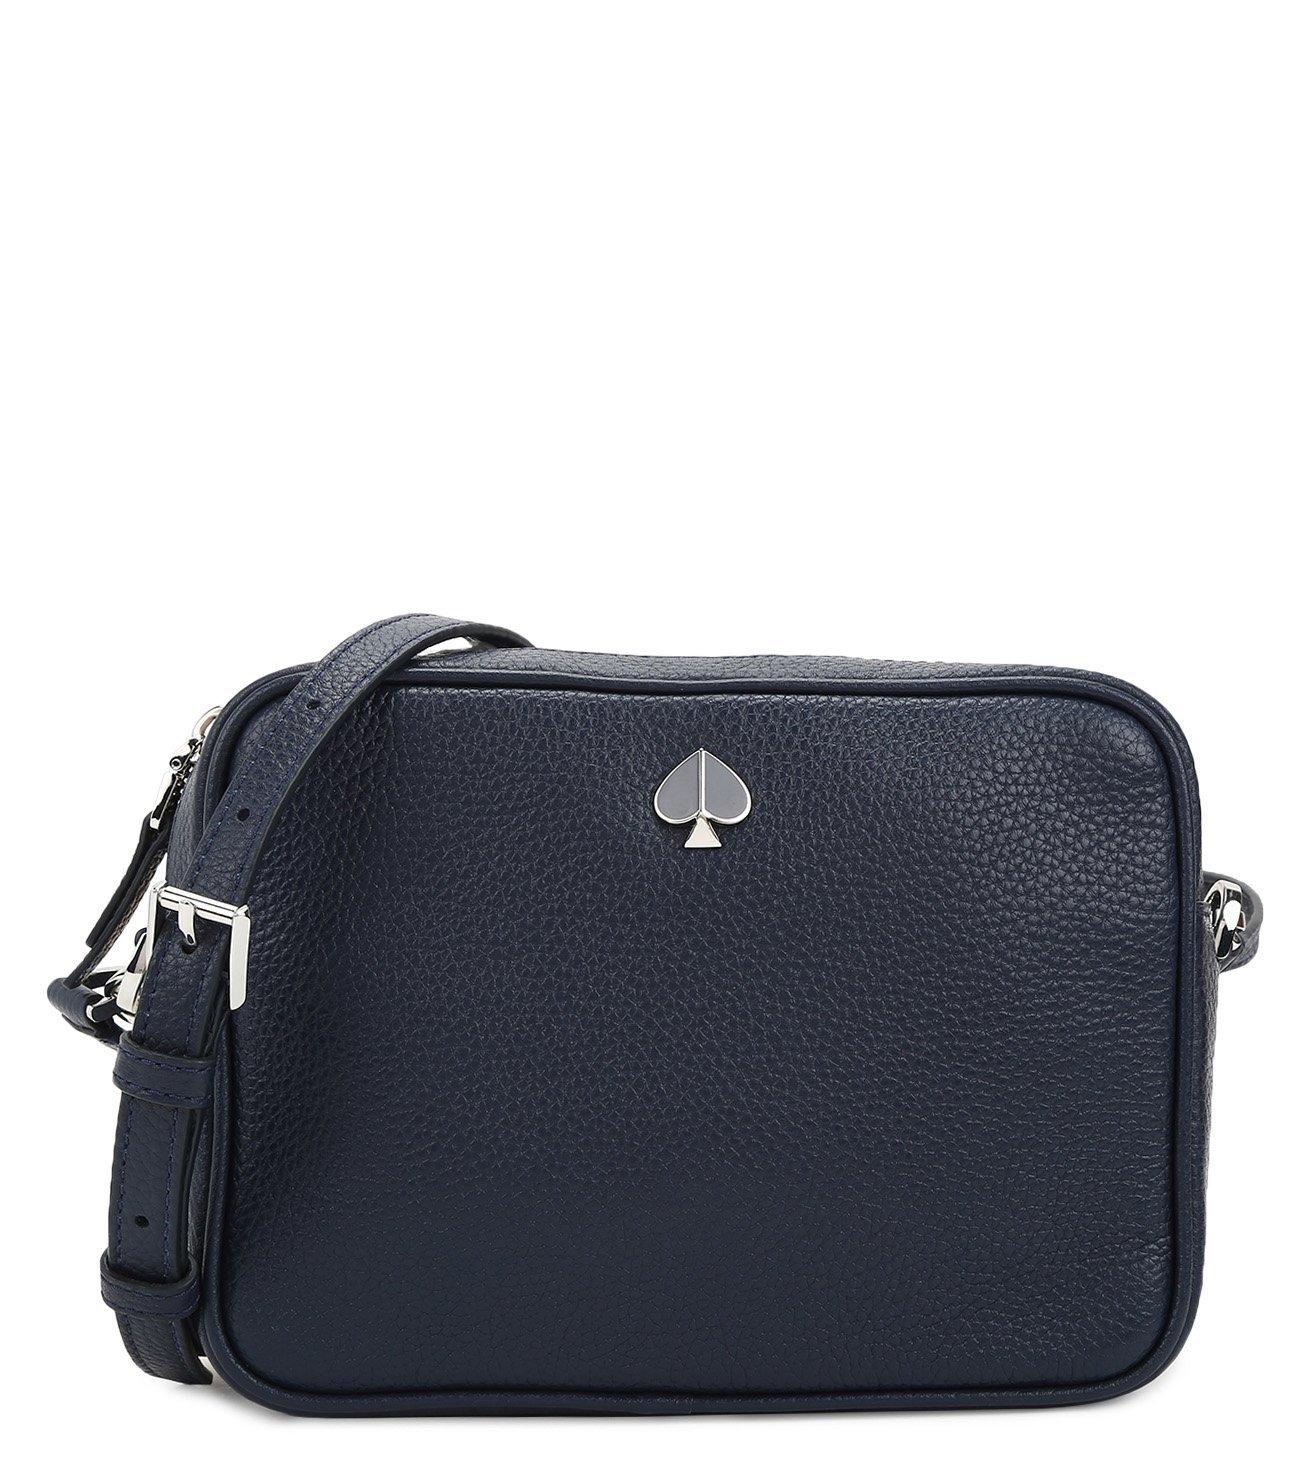 Buy Kate Spade Blazer Blue Polly Medium Cross Body Camera Bag For Women Online Tata Cliq Luxury